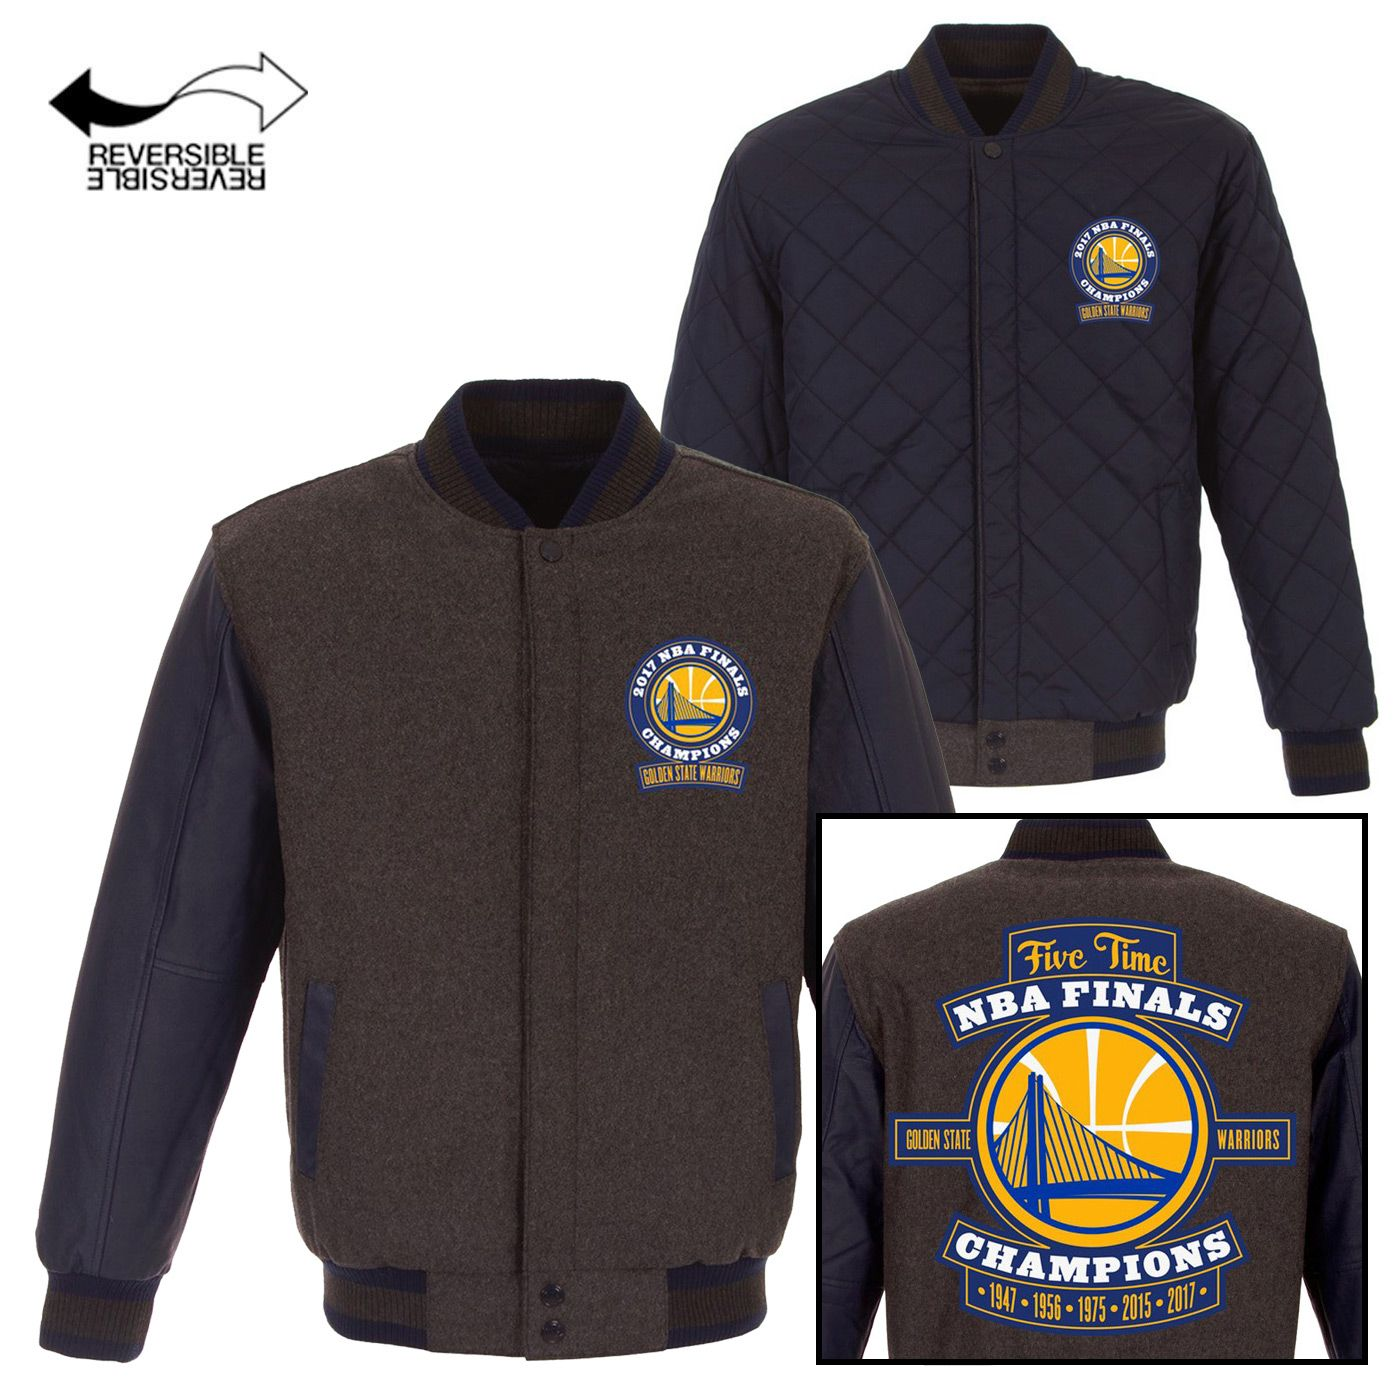 Golden State Warriors JH Design 2017 NBA Champions